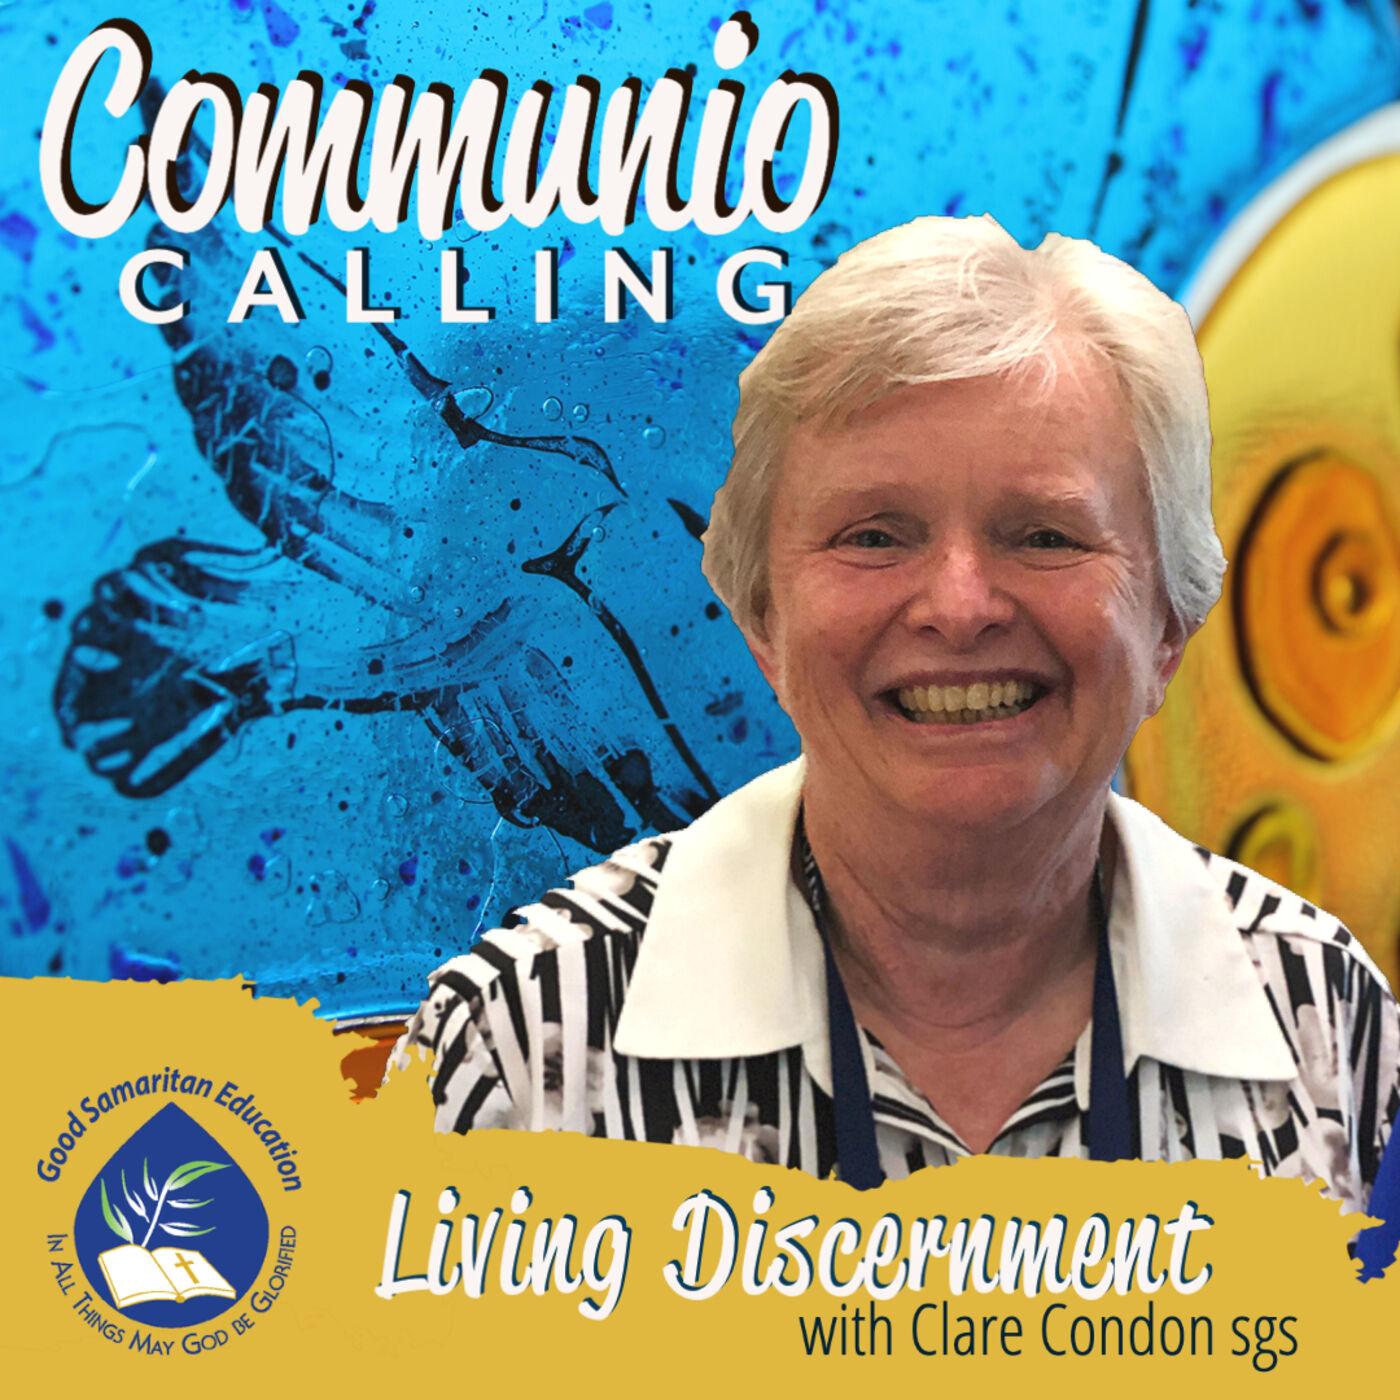 Living Discernment